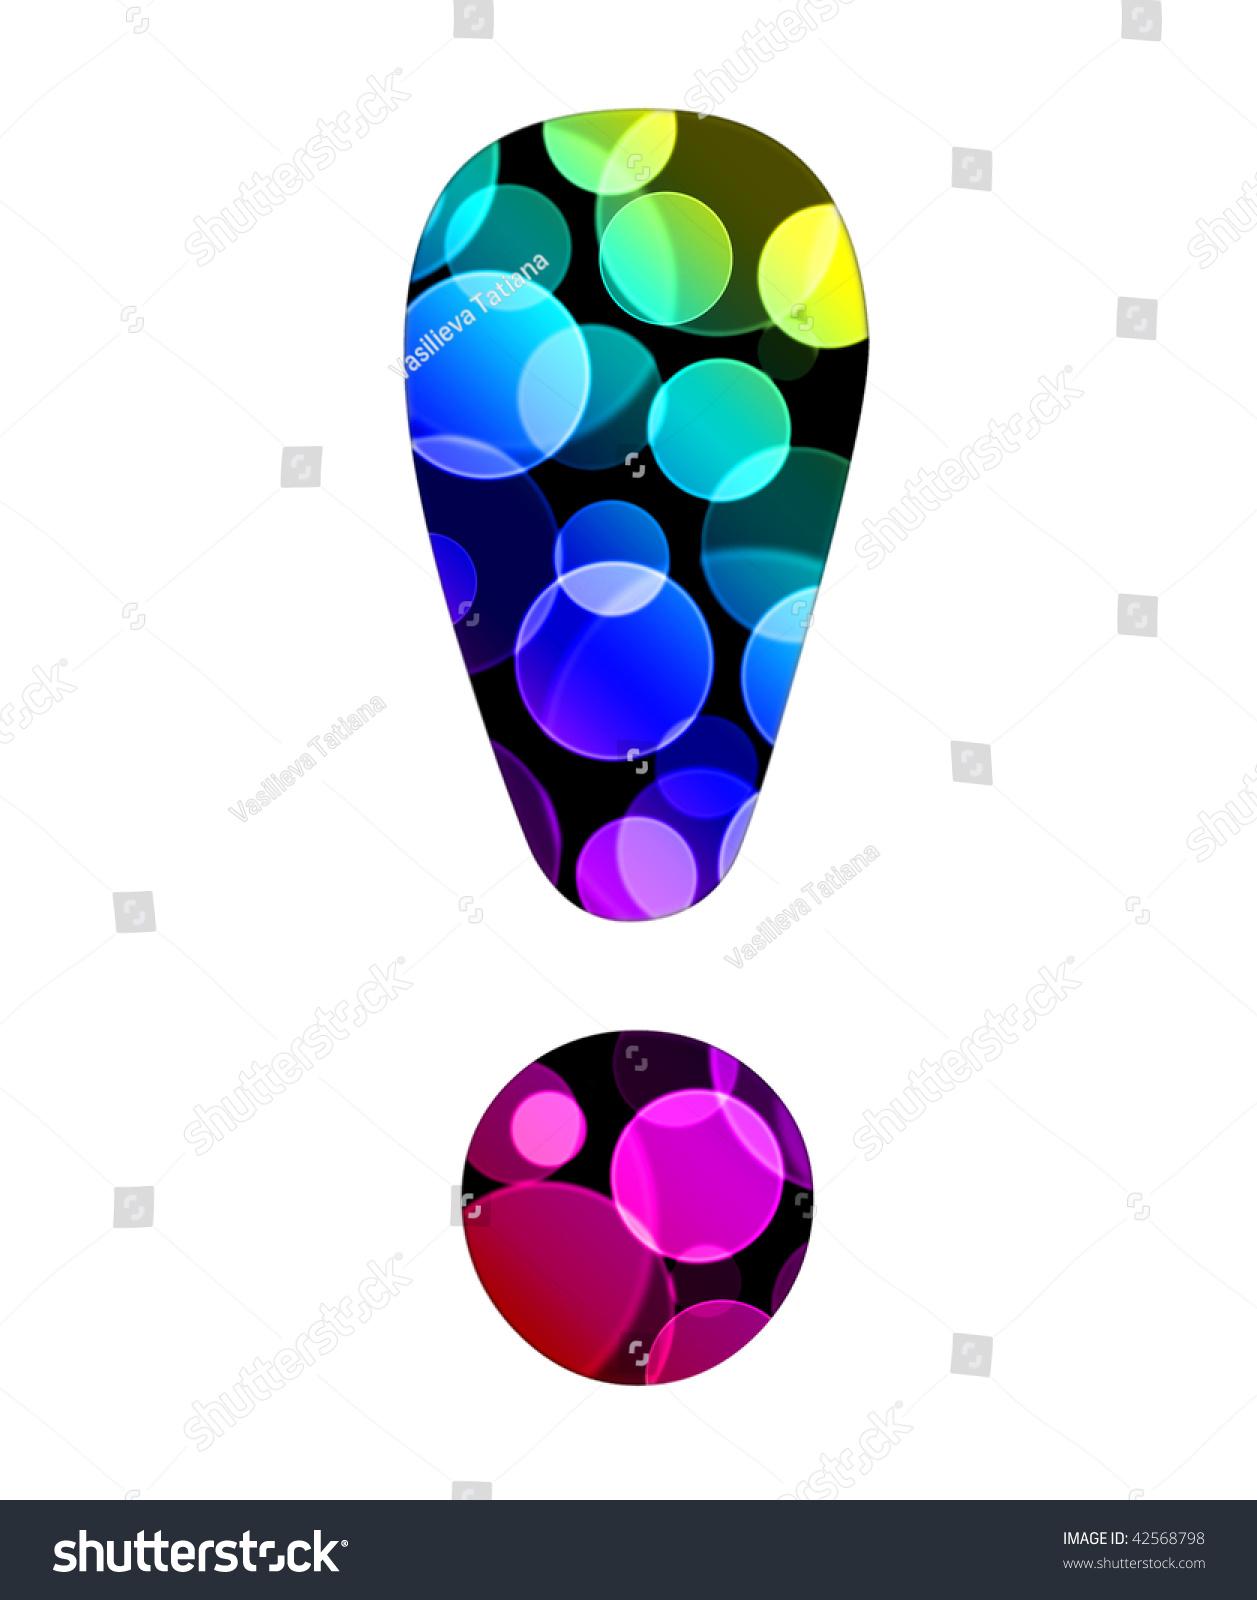 Classic Coloring Pages Alphabet   Cursive   Letters   Free ...   Bubble Letter Exclamation Point